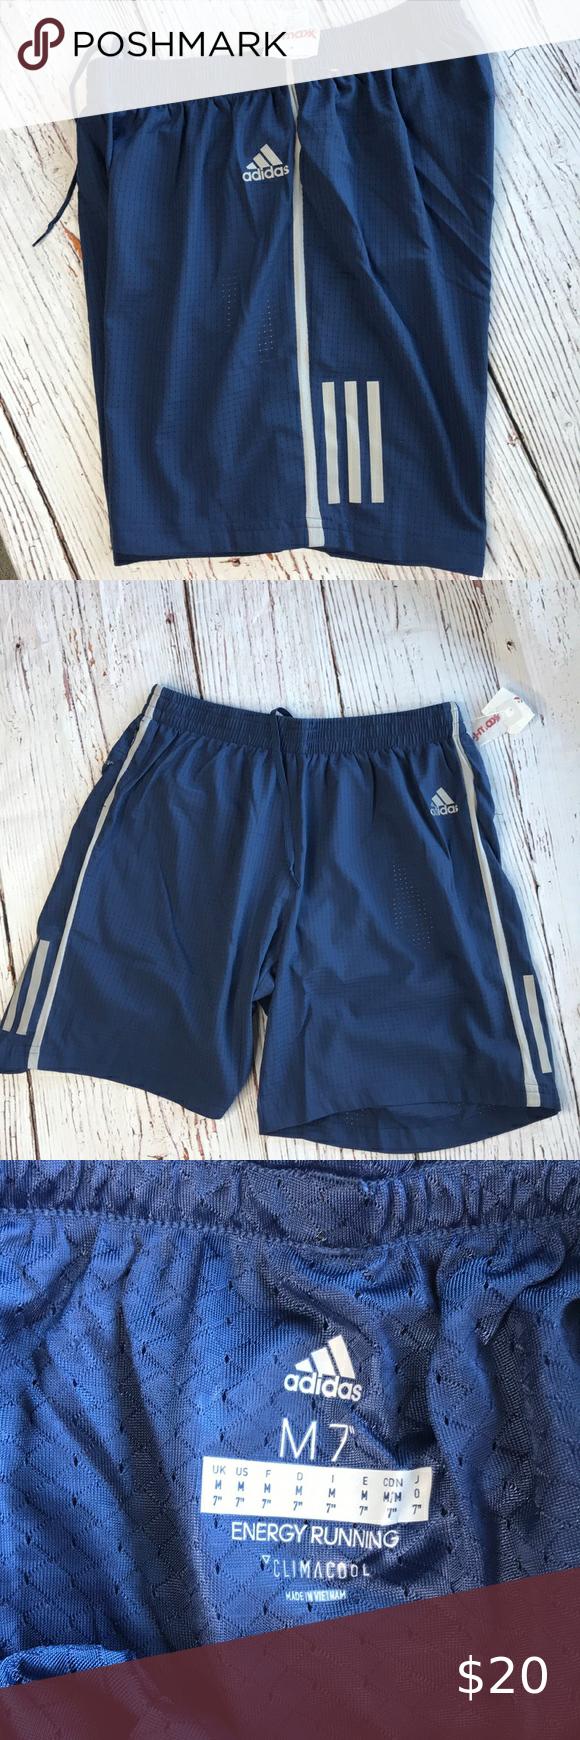 perro factor pañuelo  Adidas M7 energy Running climacool Shorts   Gym shorts womens, Adidas,  Shorts